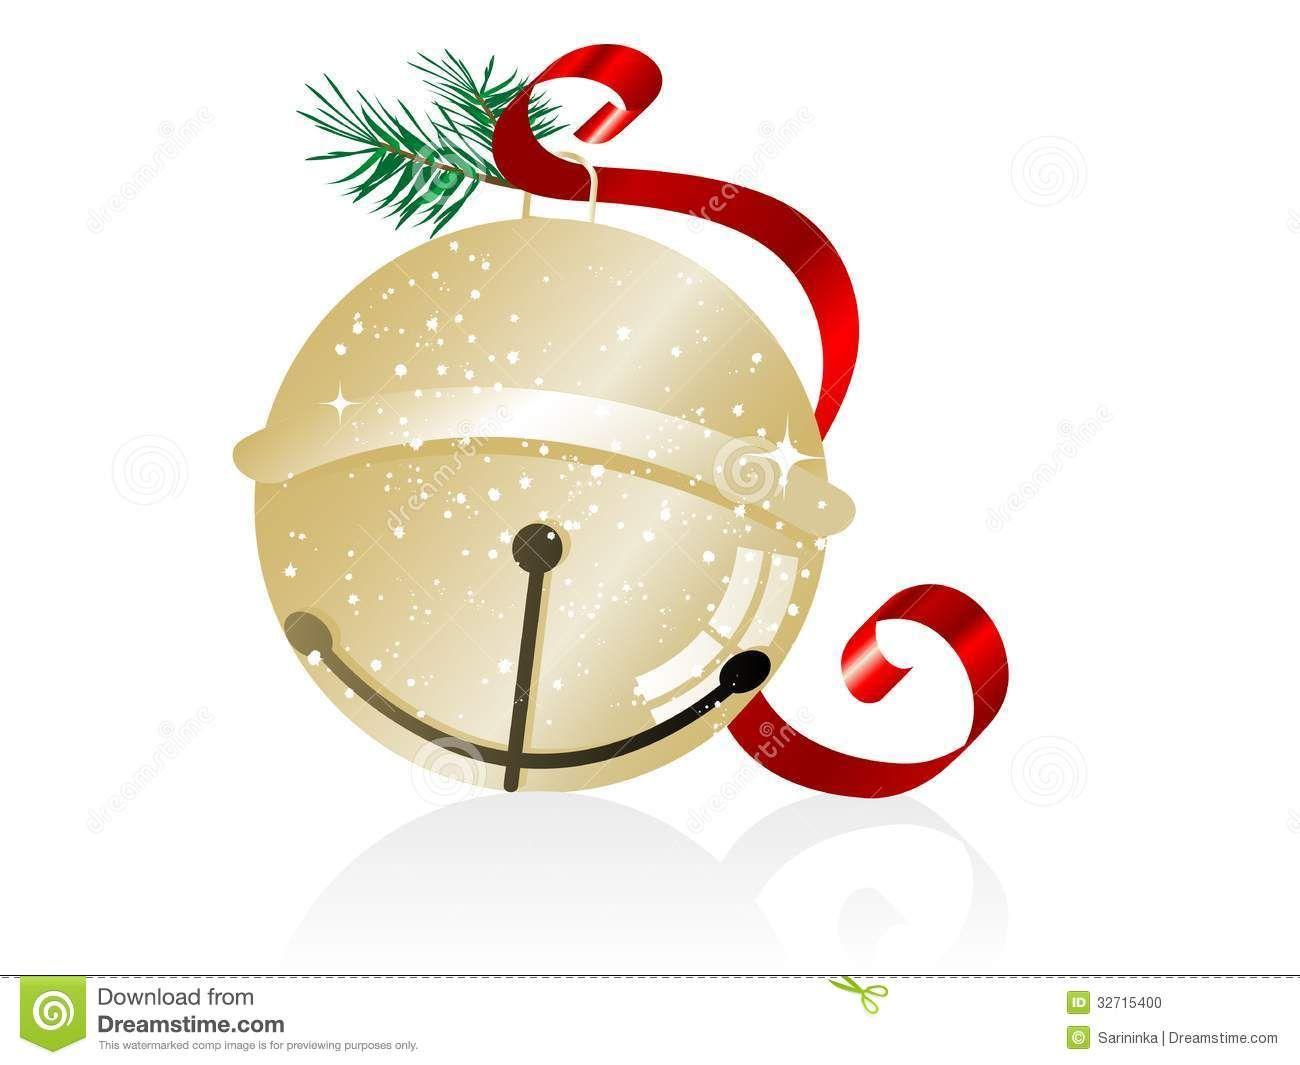 jingle bells clip art jingle bell sleigh painted pinterest rh pinterest ie jingle bell clipart png jingle bell clipart png